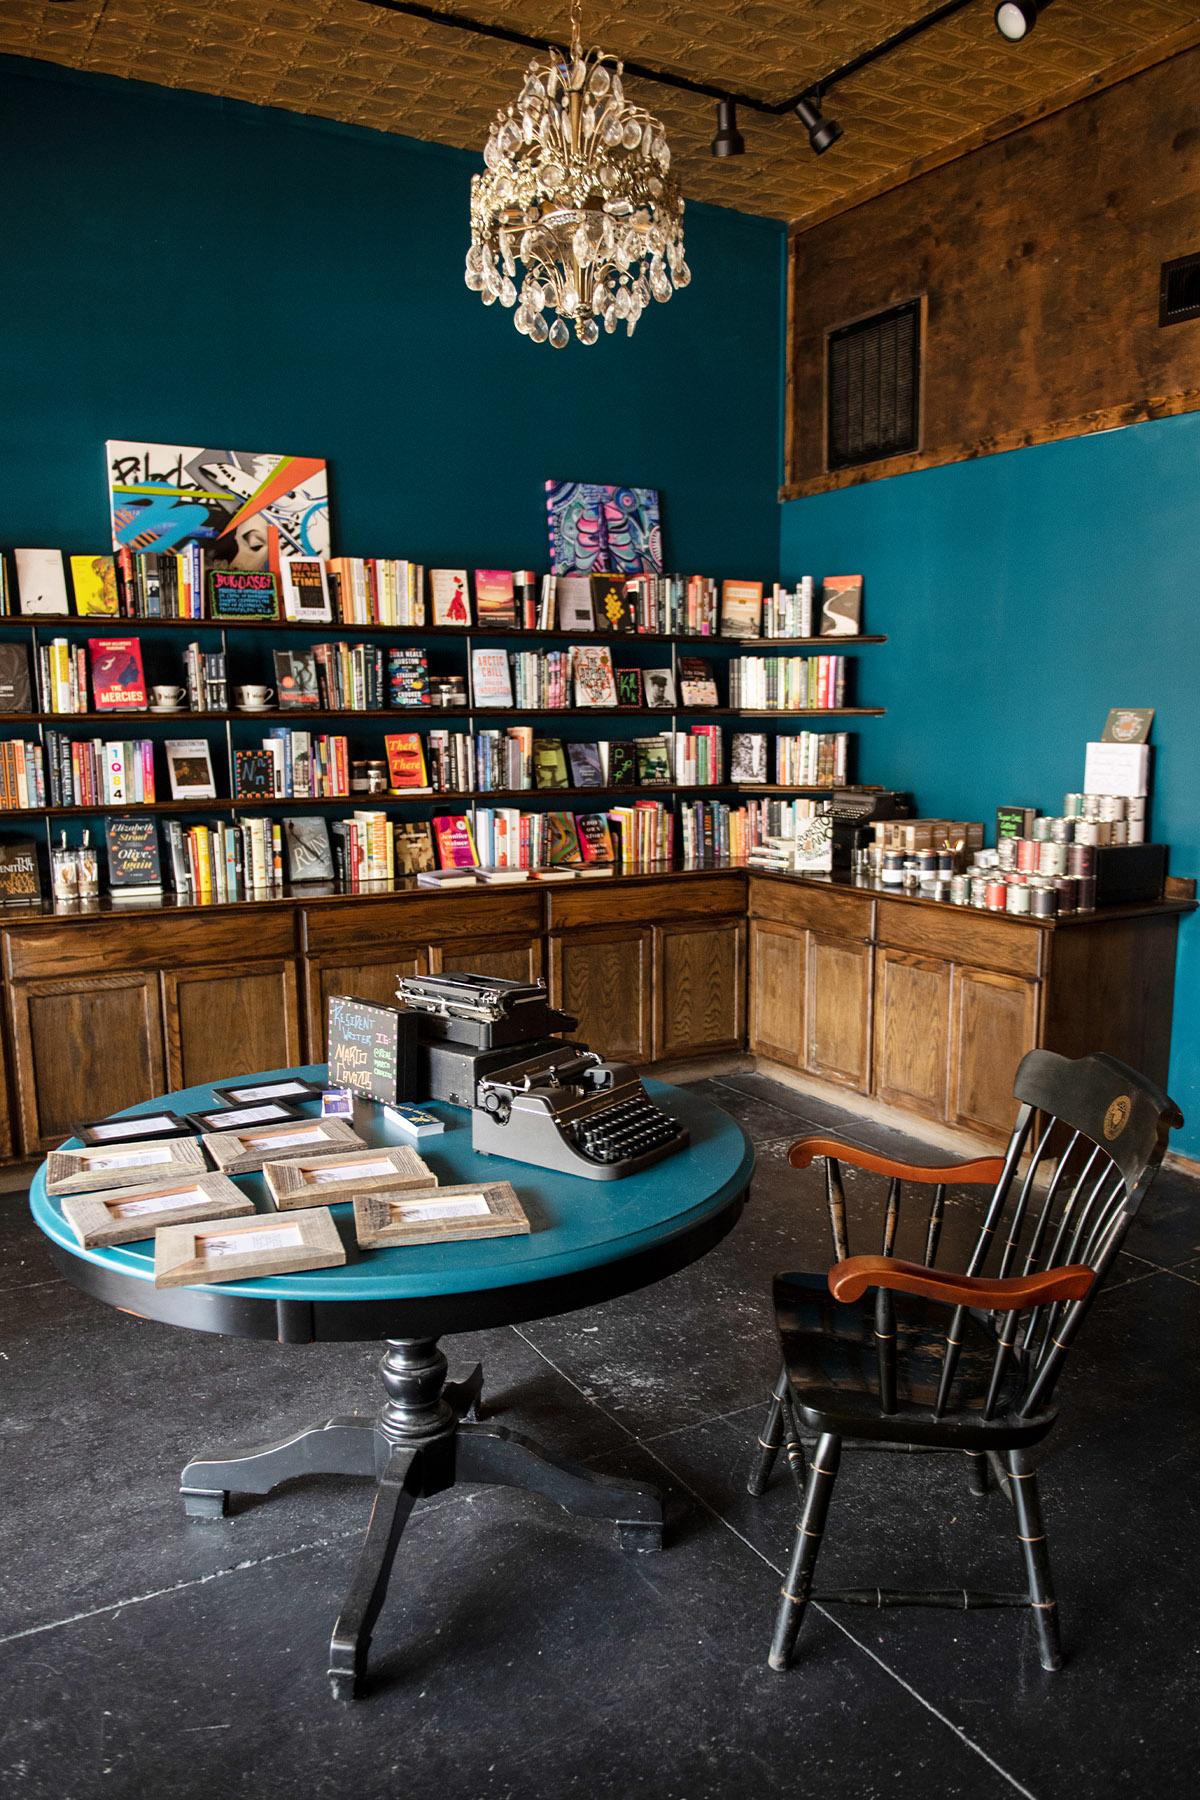 Marco Cavazos' Oak Cliff Poet Book shop and studio